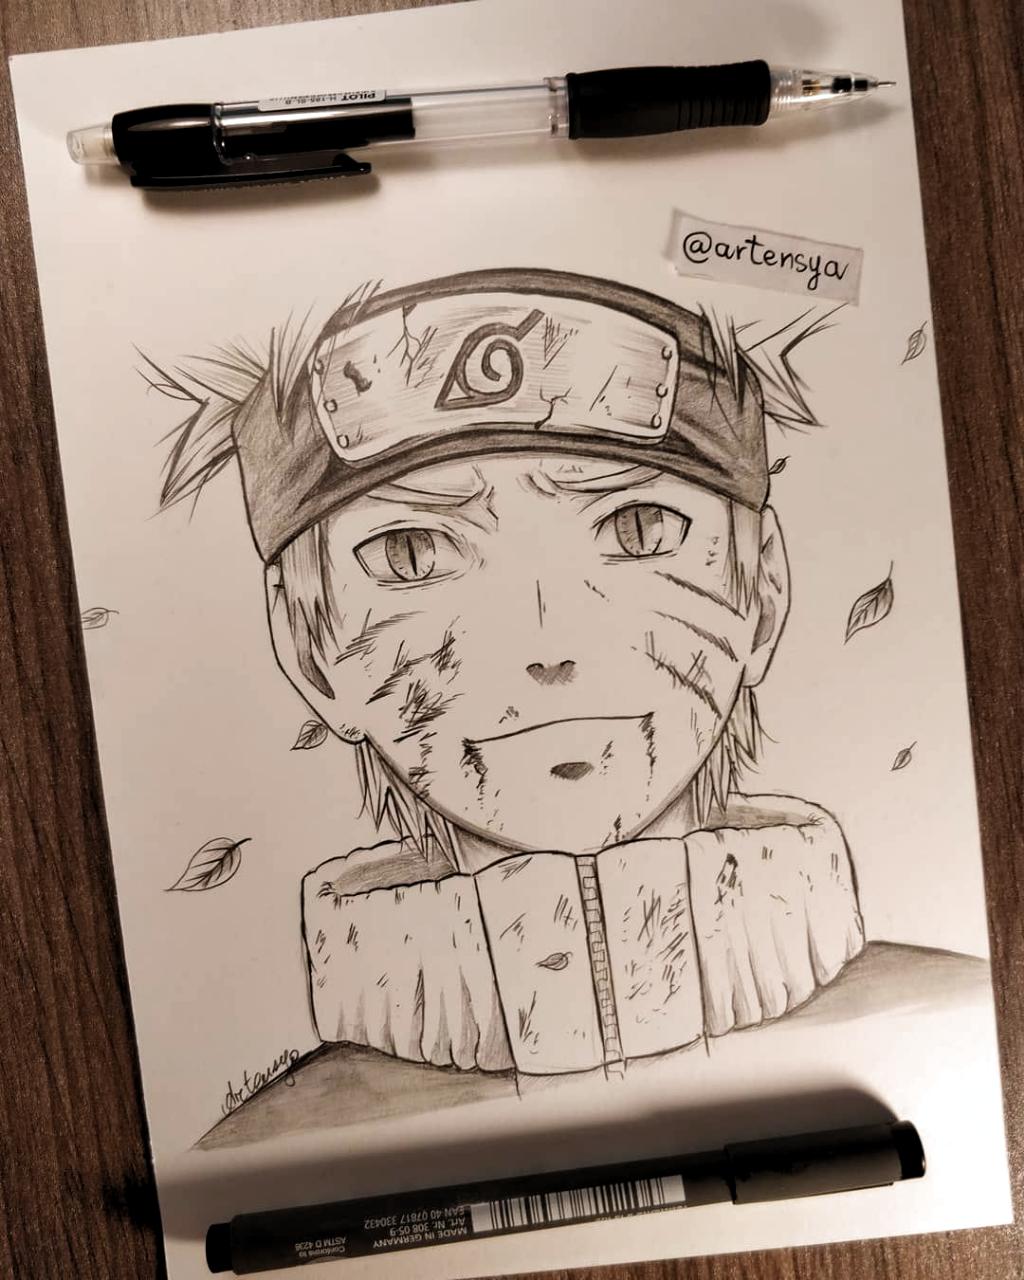 Naruto Uzumaki I Love This Draw Hope U Like It Follow Me Artensya En 2020 Jeux Dessin Coloriage Naruto Tutoriel De Dessin